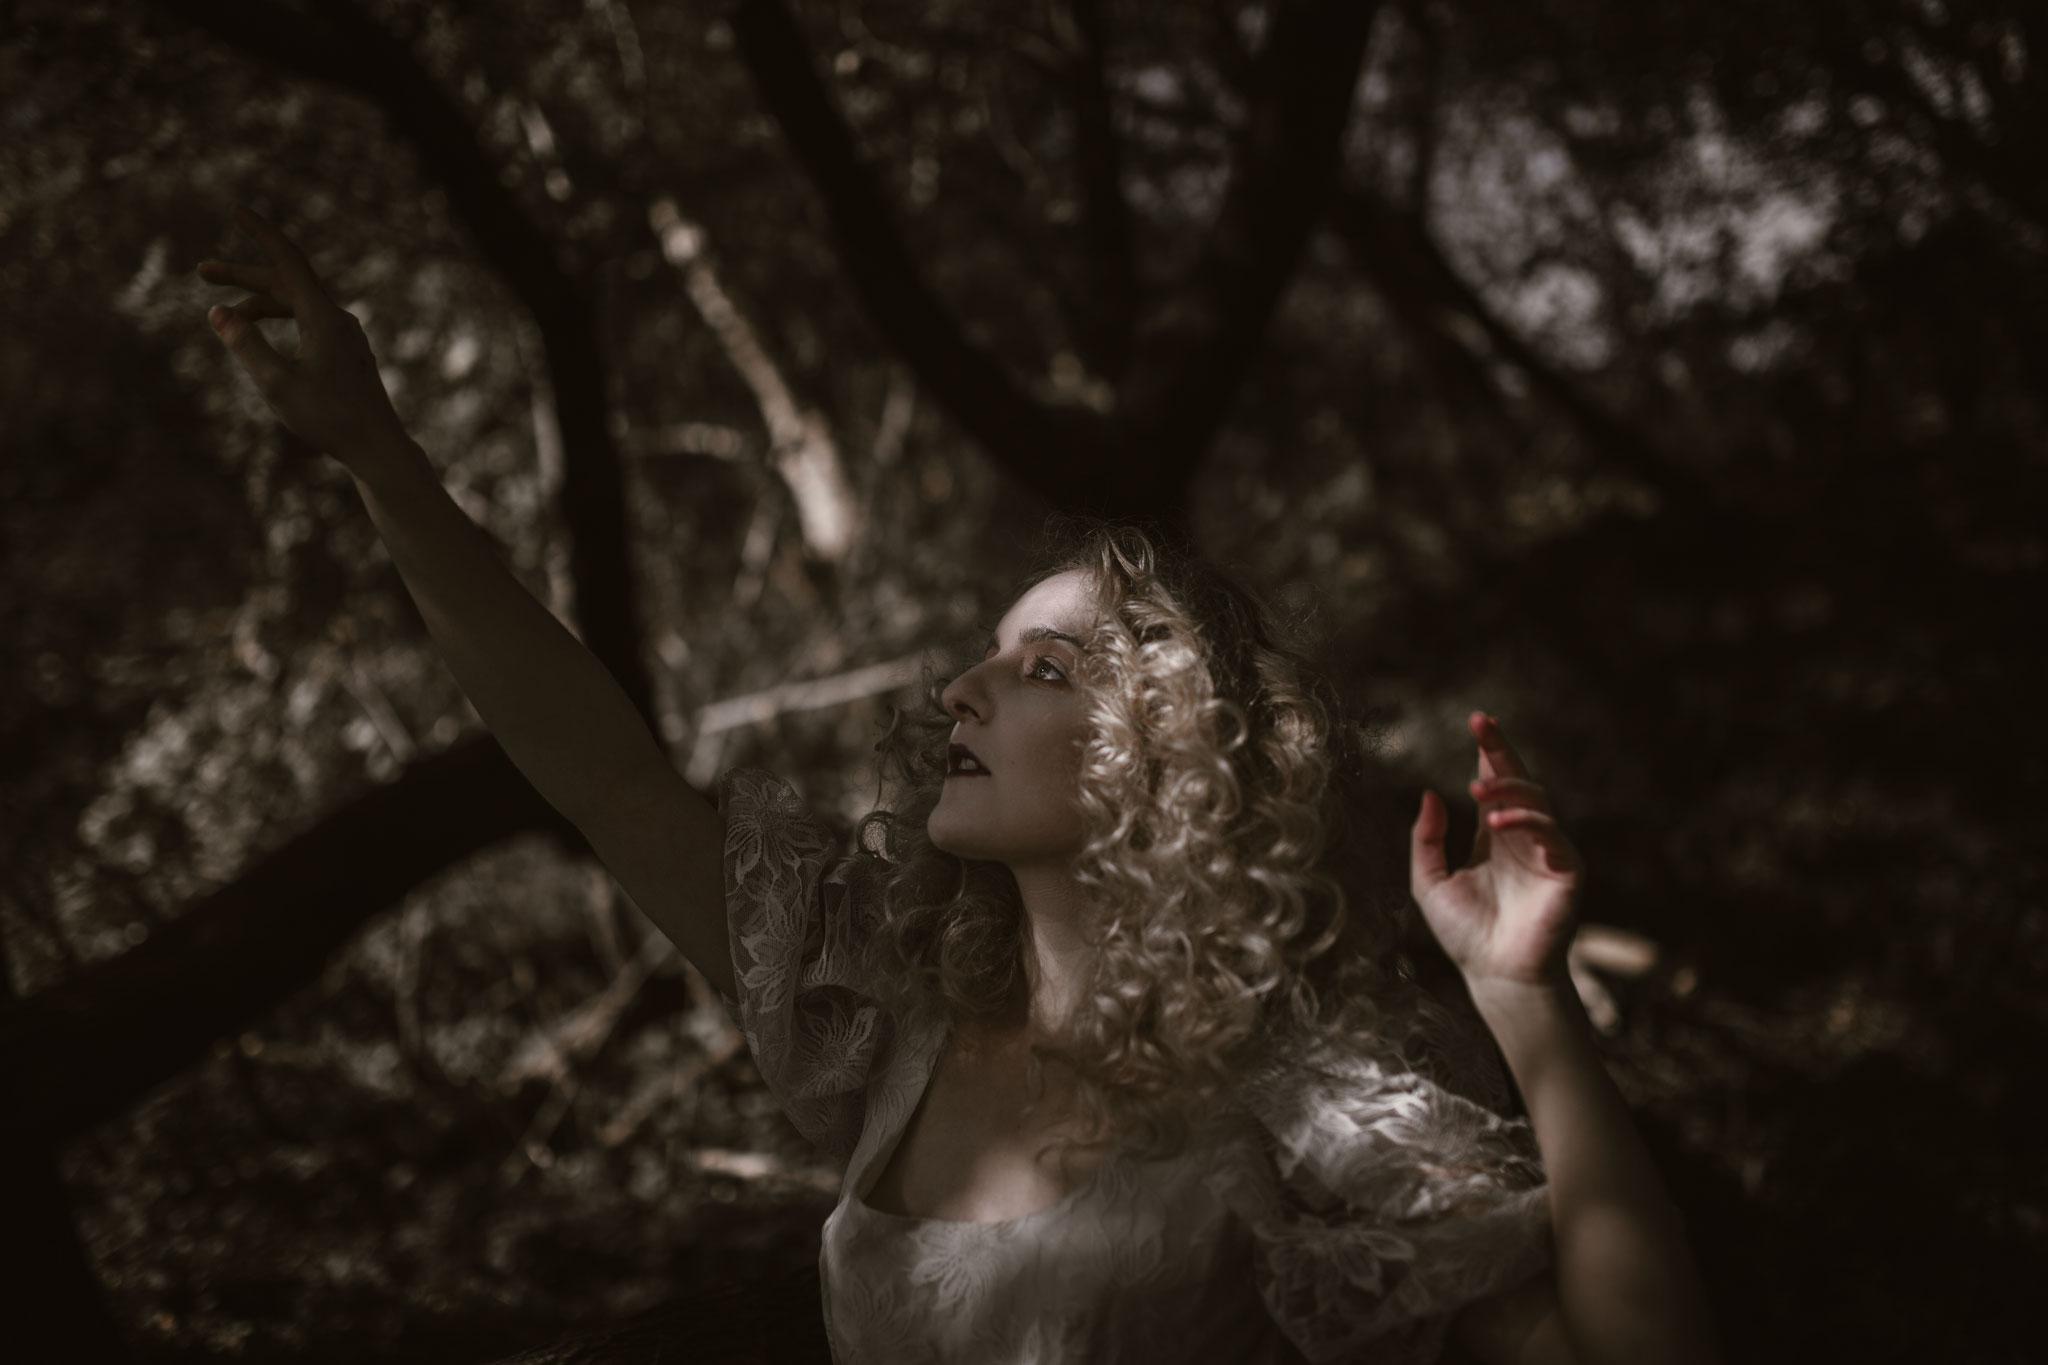 pale-witch-147fb.jpg